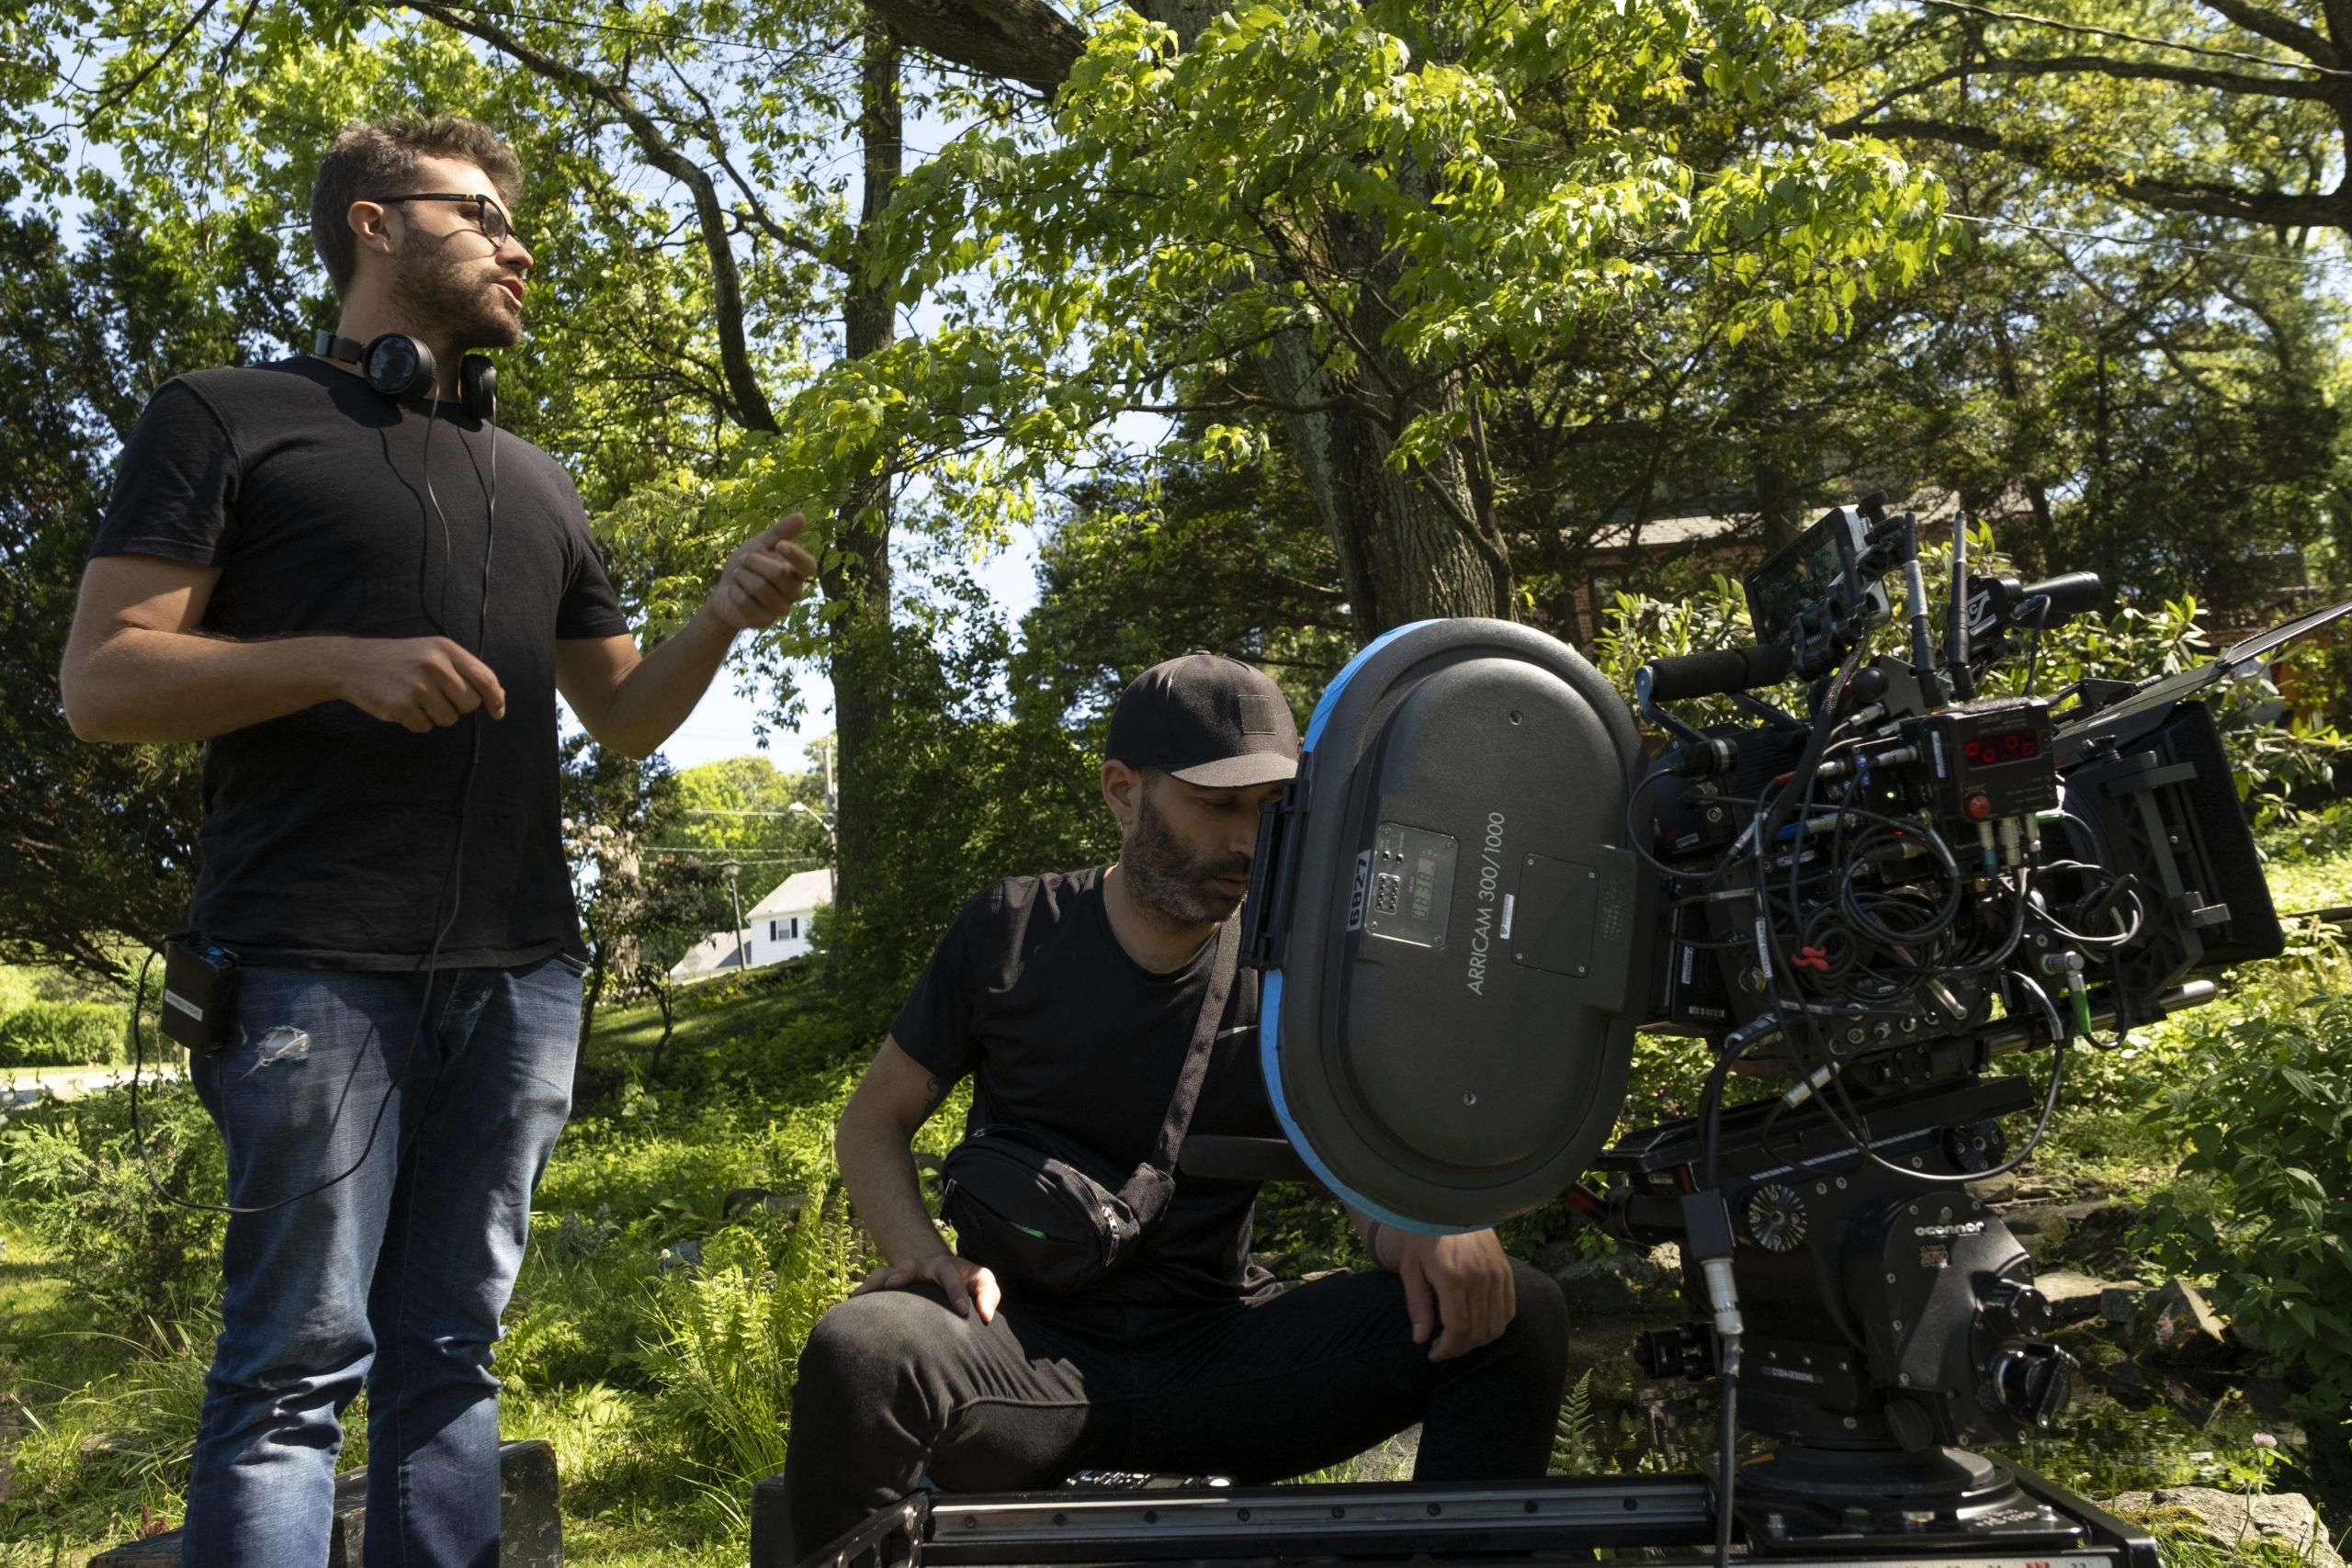 Director Richard Tanne & cinematographer Albert Salas on the set of Chemical Hearts.